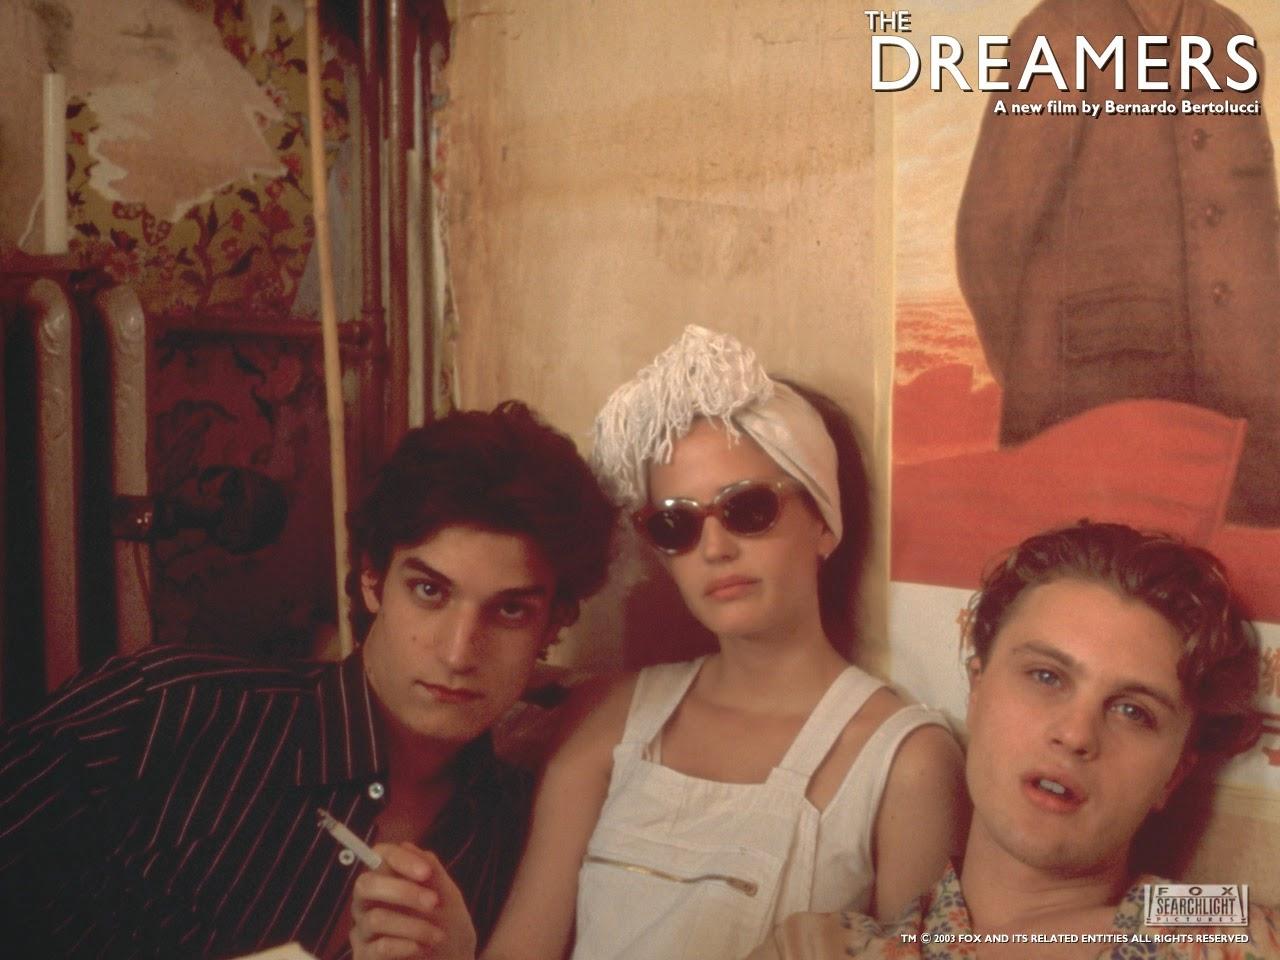 Halcombe Norilsk: The Dreamers: Discovering Eva Green.